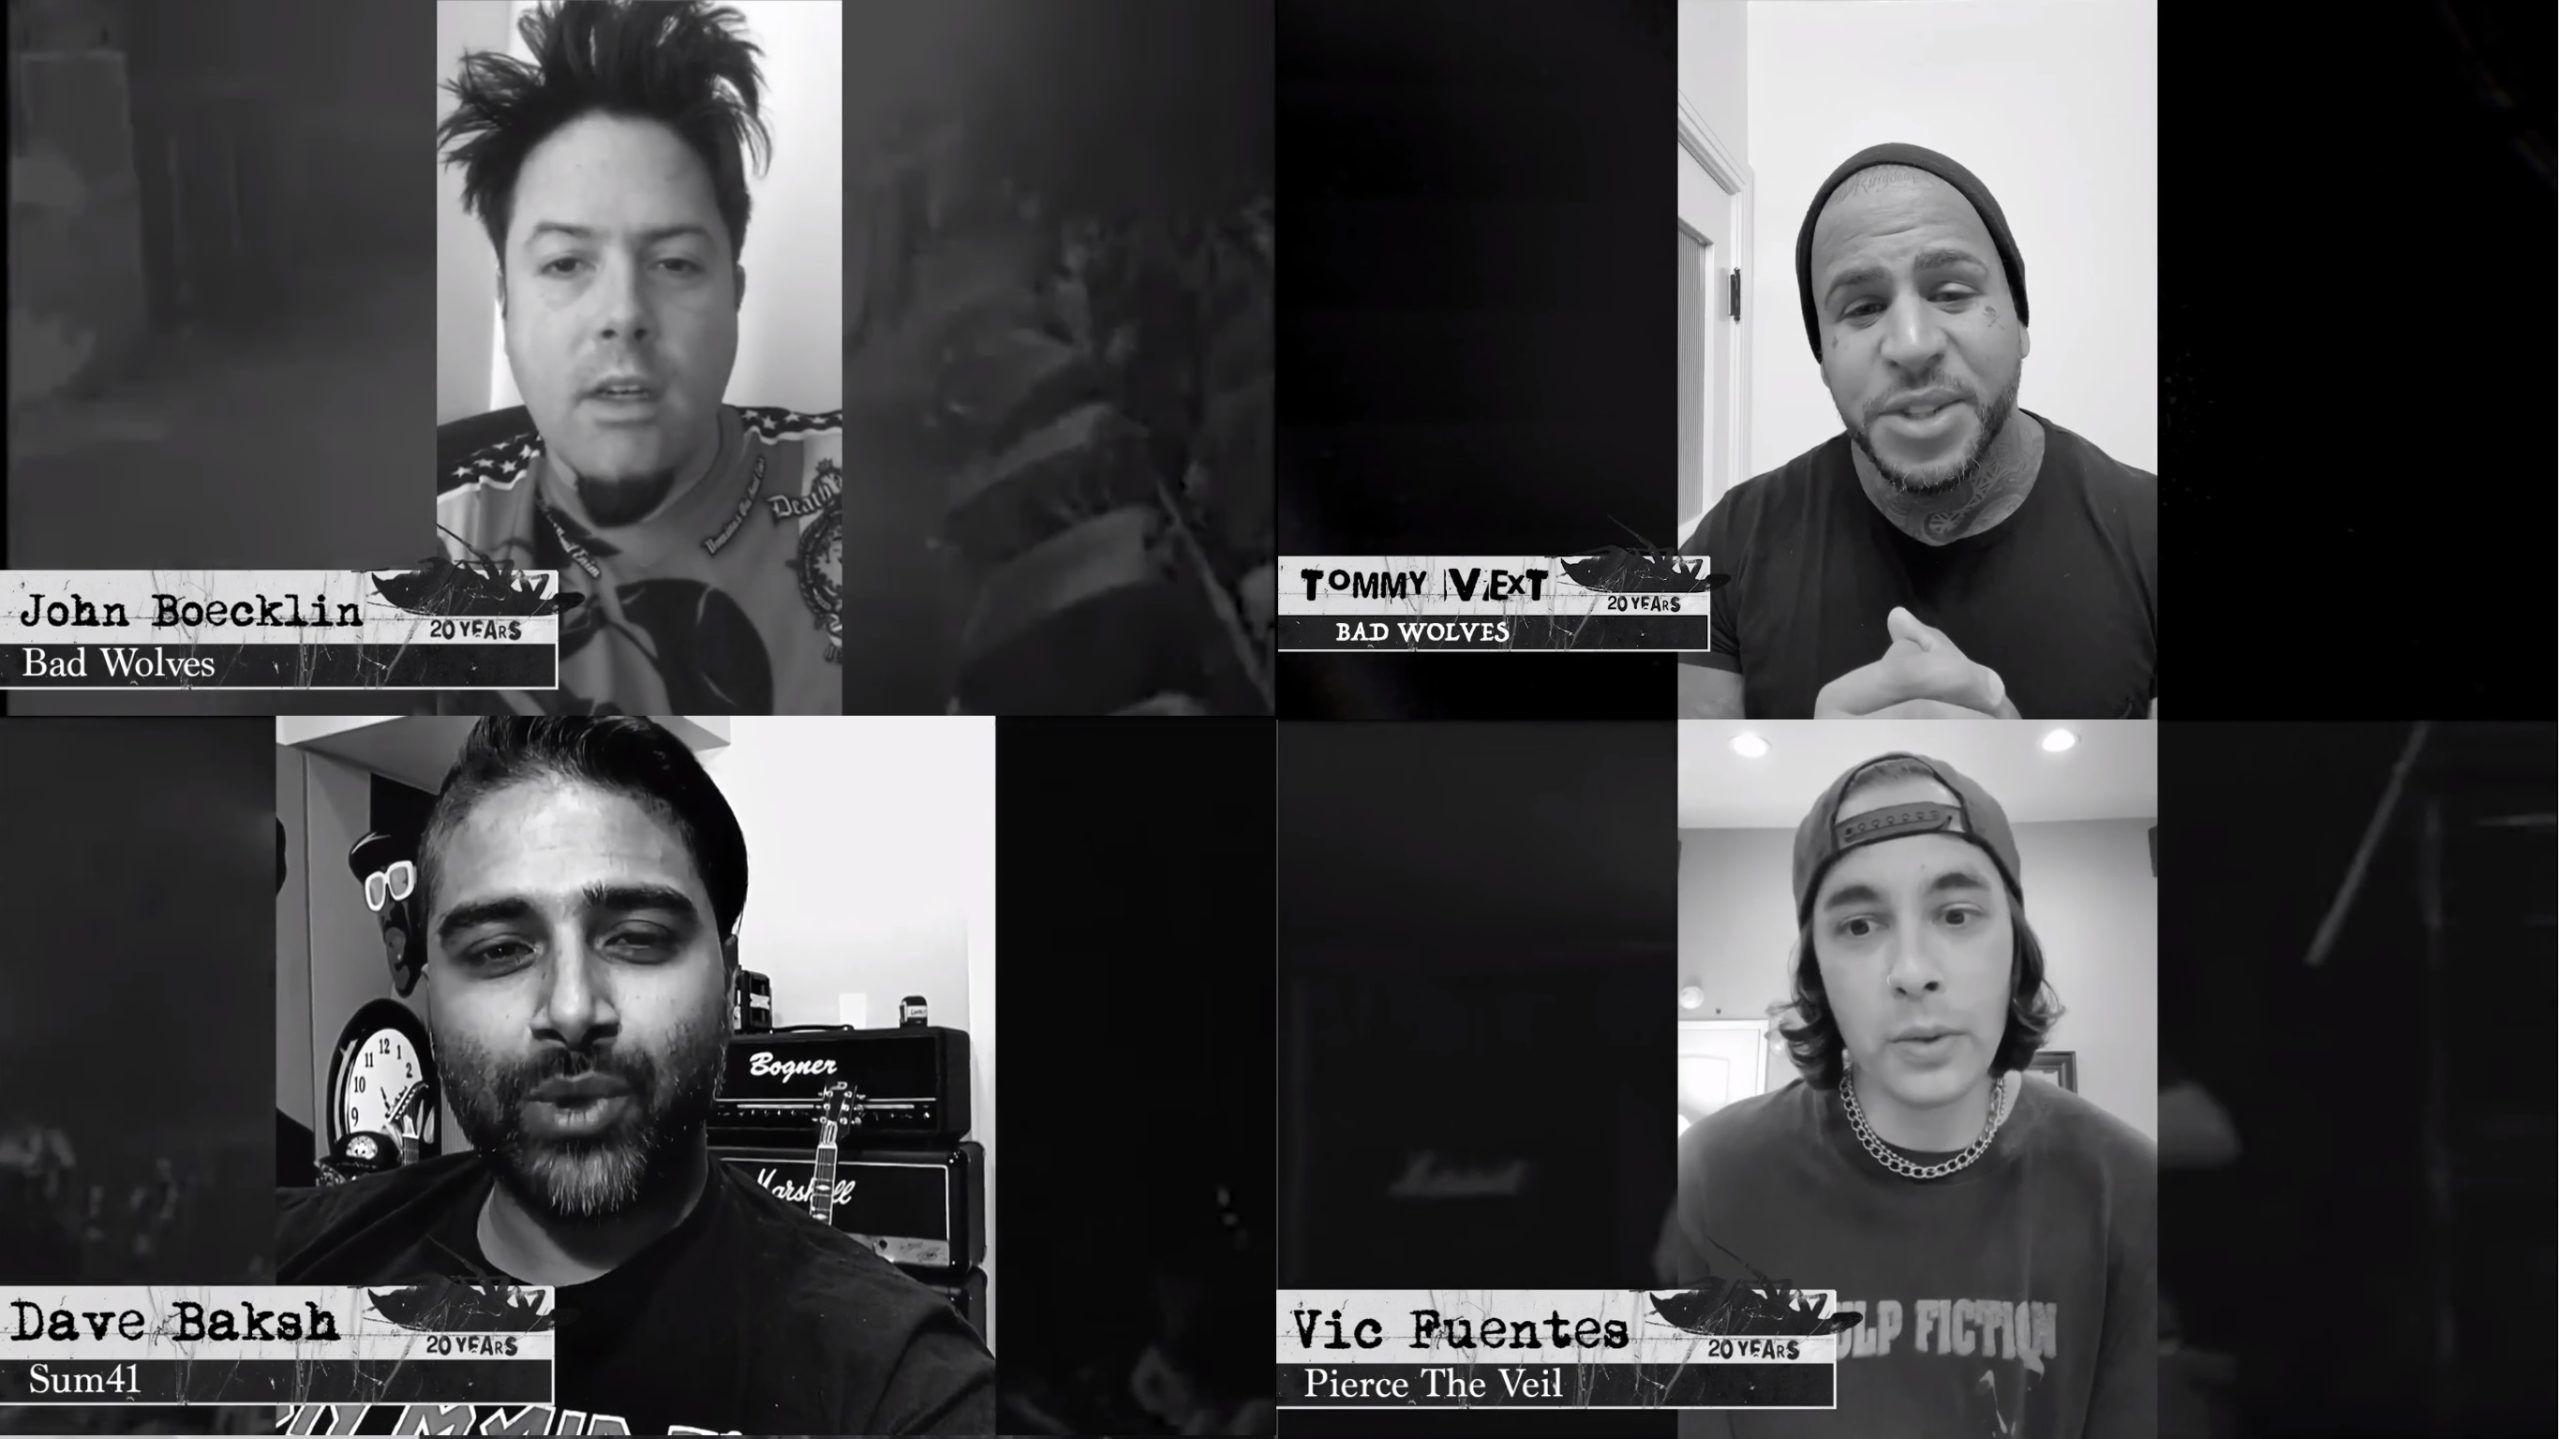 Papa Roach Bad Wolves Sum 41 Pierce The Veil